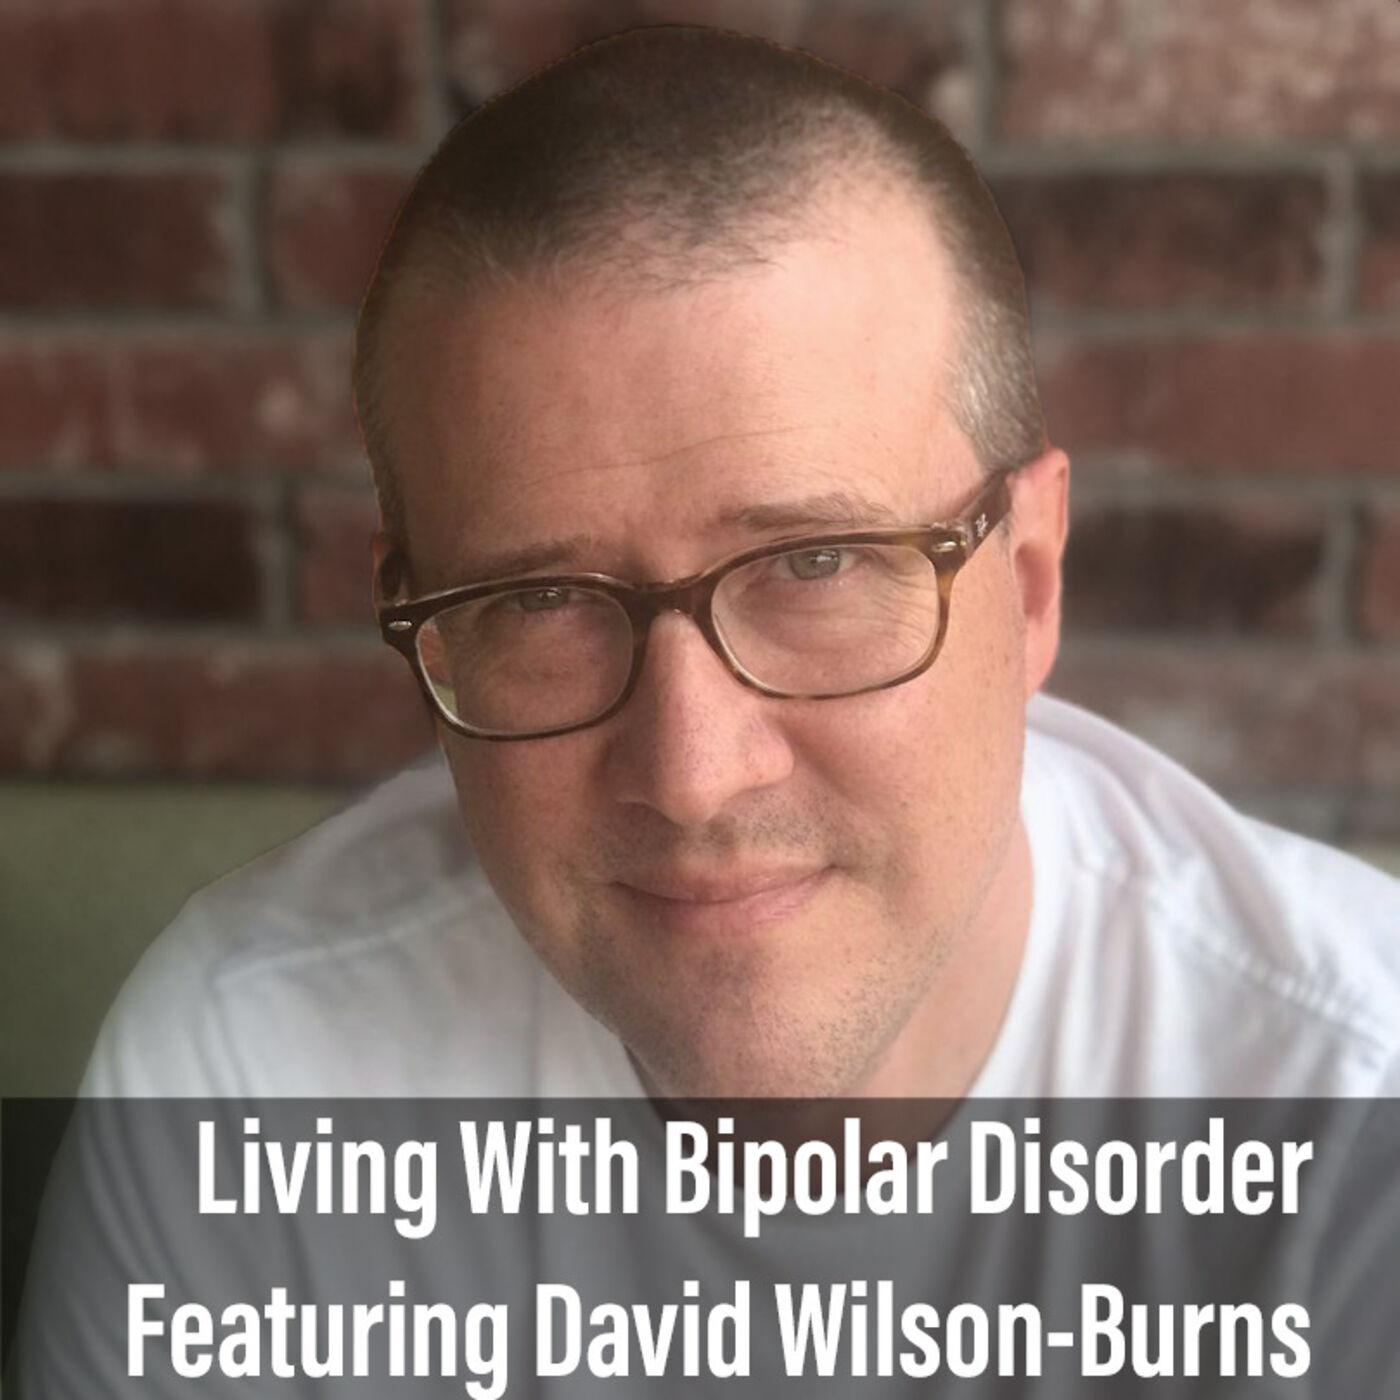 Life With Bipolar Disorder Featuring David Wilson-Burns